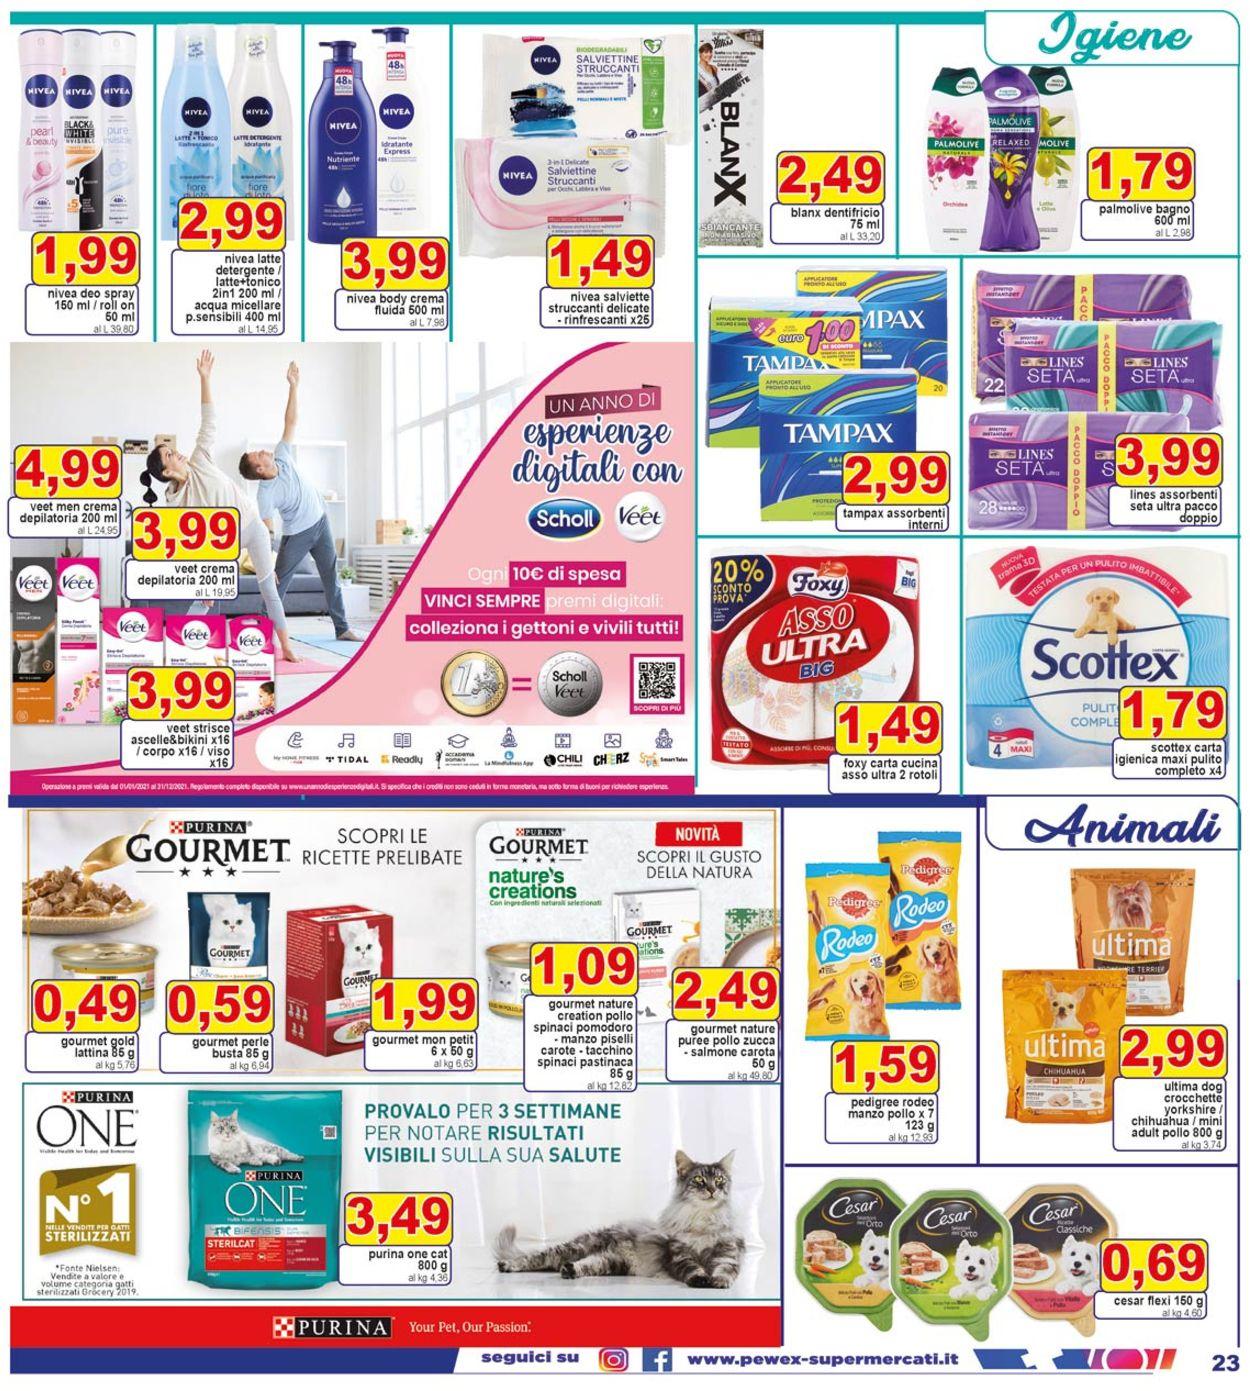 Volantino Pewex - Offerte 19/05-27/05/2021 (Pagina 23)